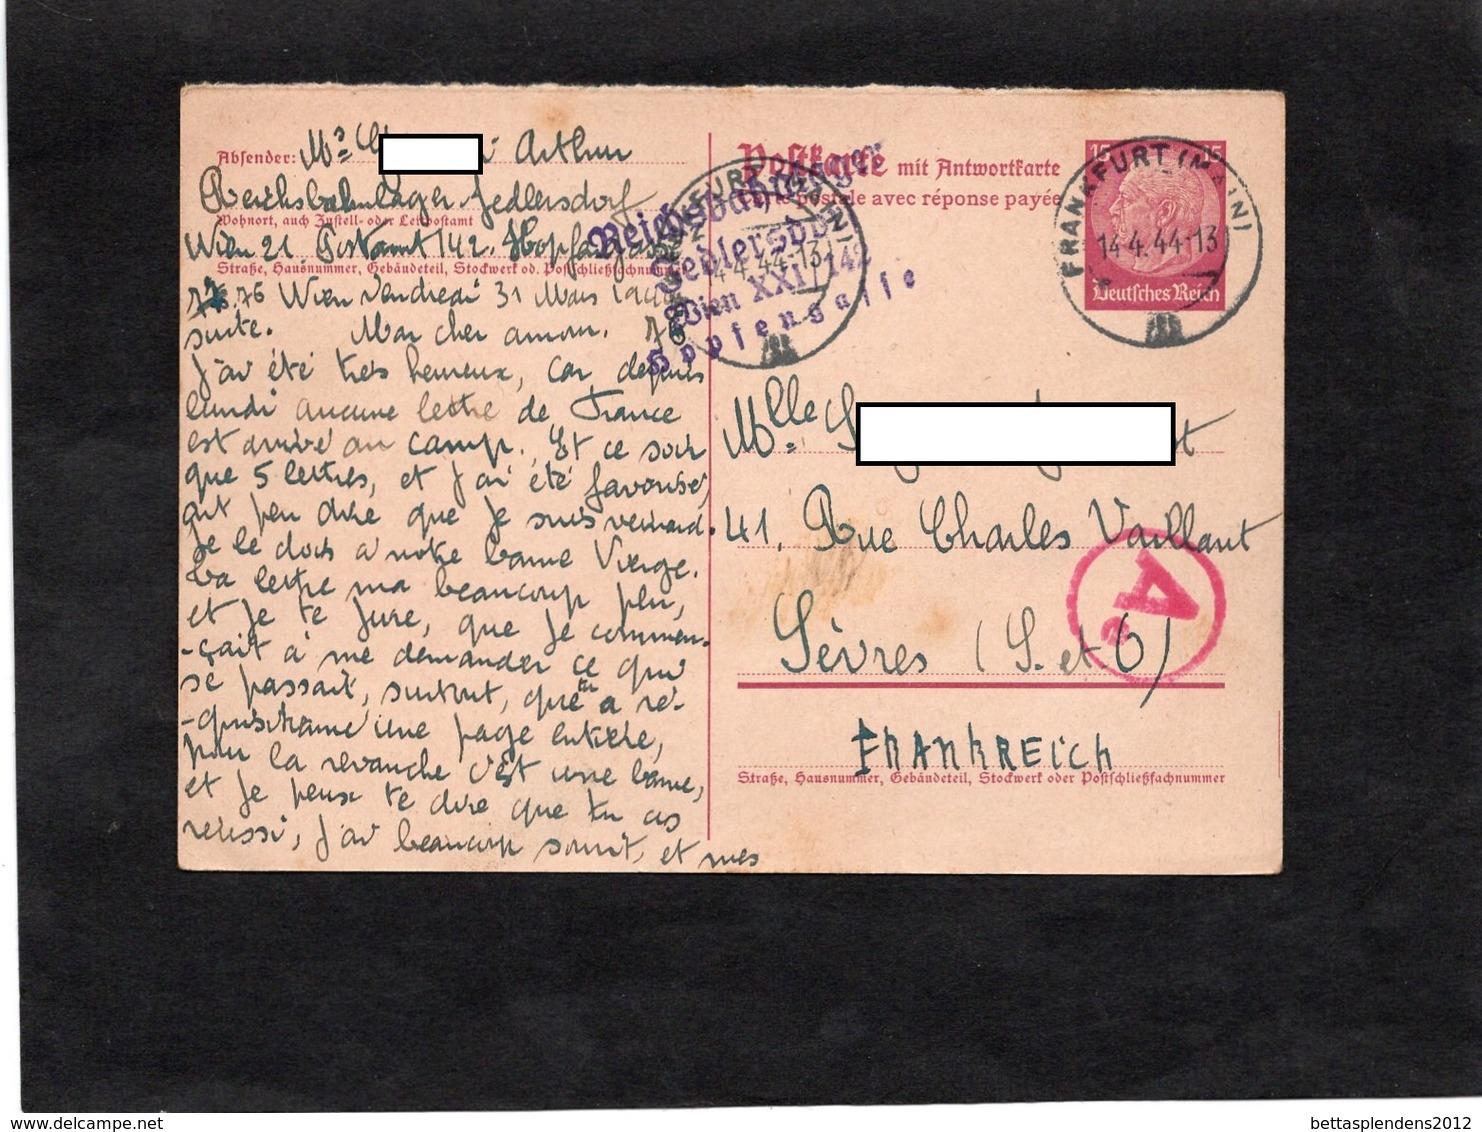 Entier Postal - Griffe REICHSBAHNLAGER GEBLERSDORF WIEN XXI / 142 & Cachet Frankfurt (Main) 1944 - Griffe Censure Ae - Germany